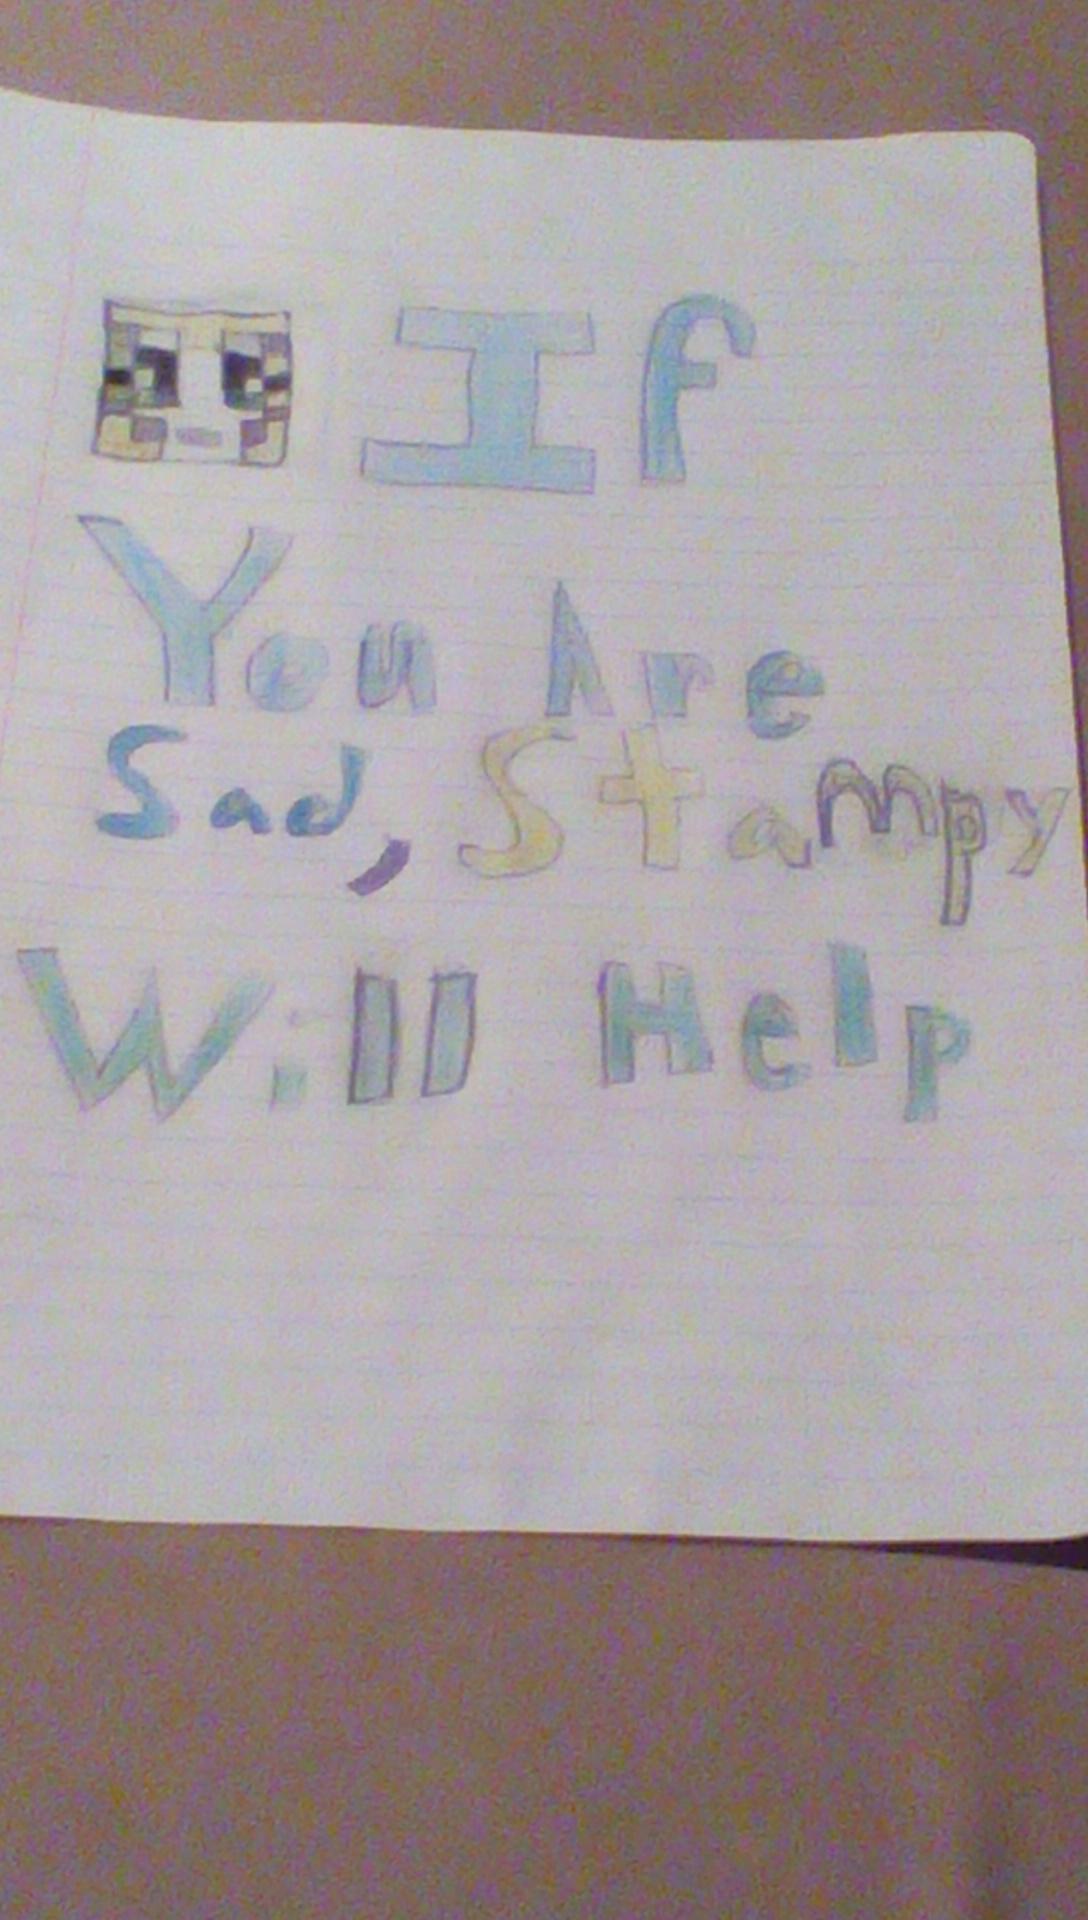 Stampy will make आप happy